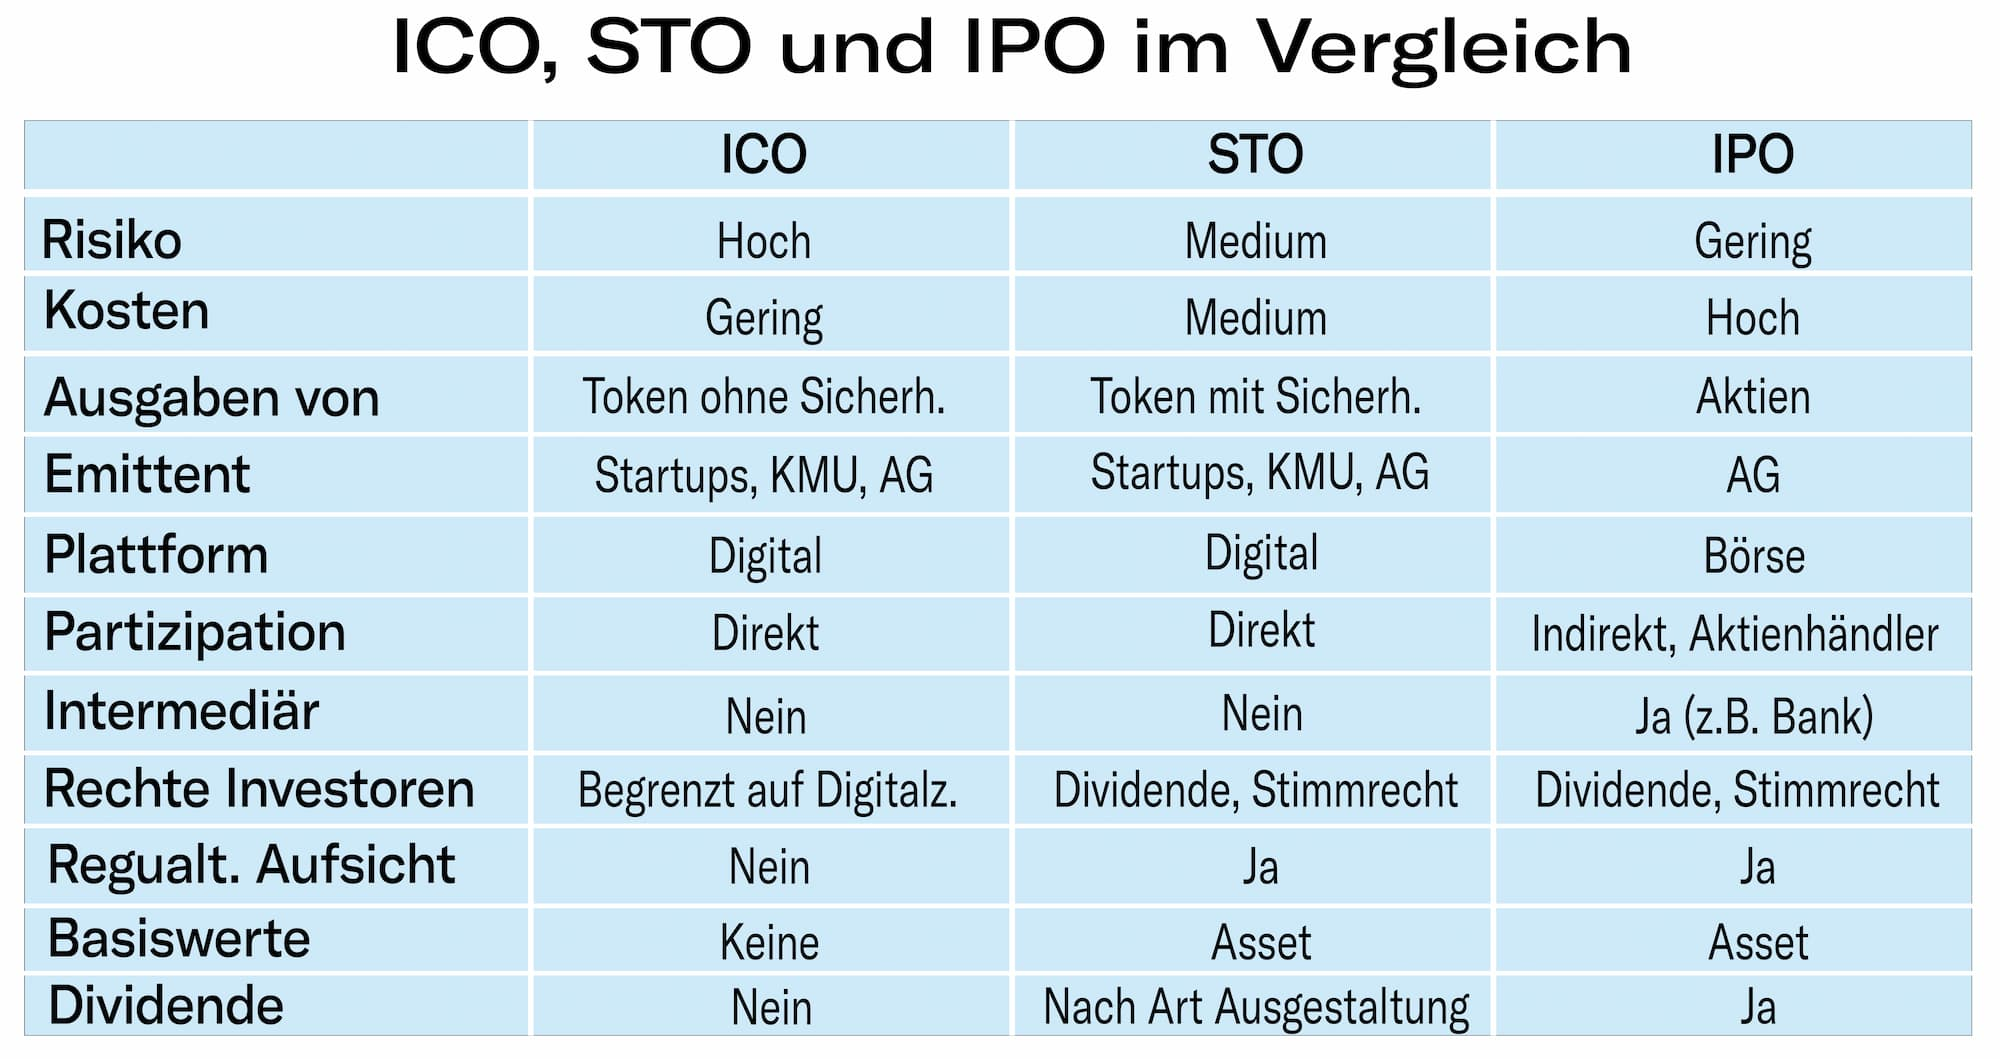 Vergleich ICO STO IPO